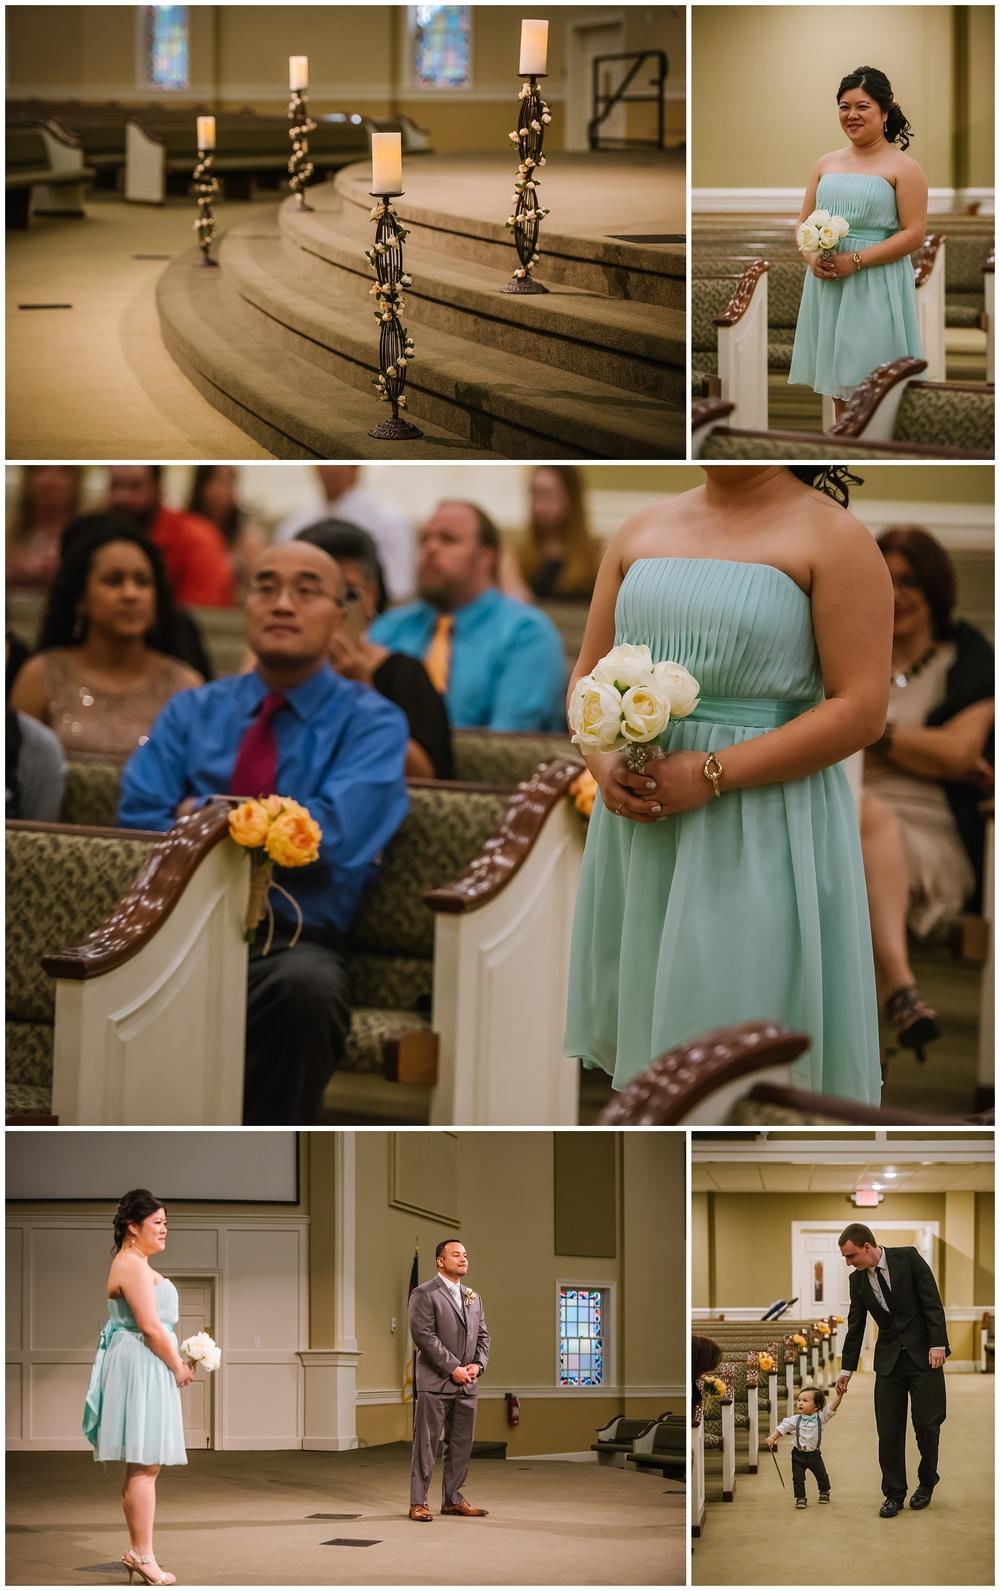 tampa-wedding-photographer-winthrop-barn-ivy-wall-portraits_0153.jpg